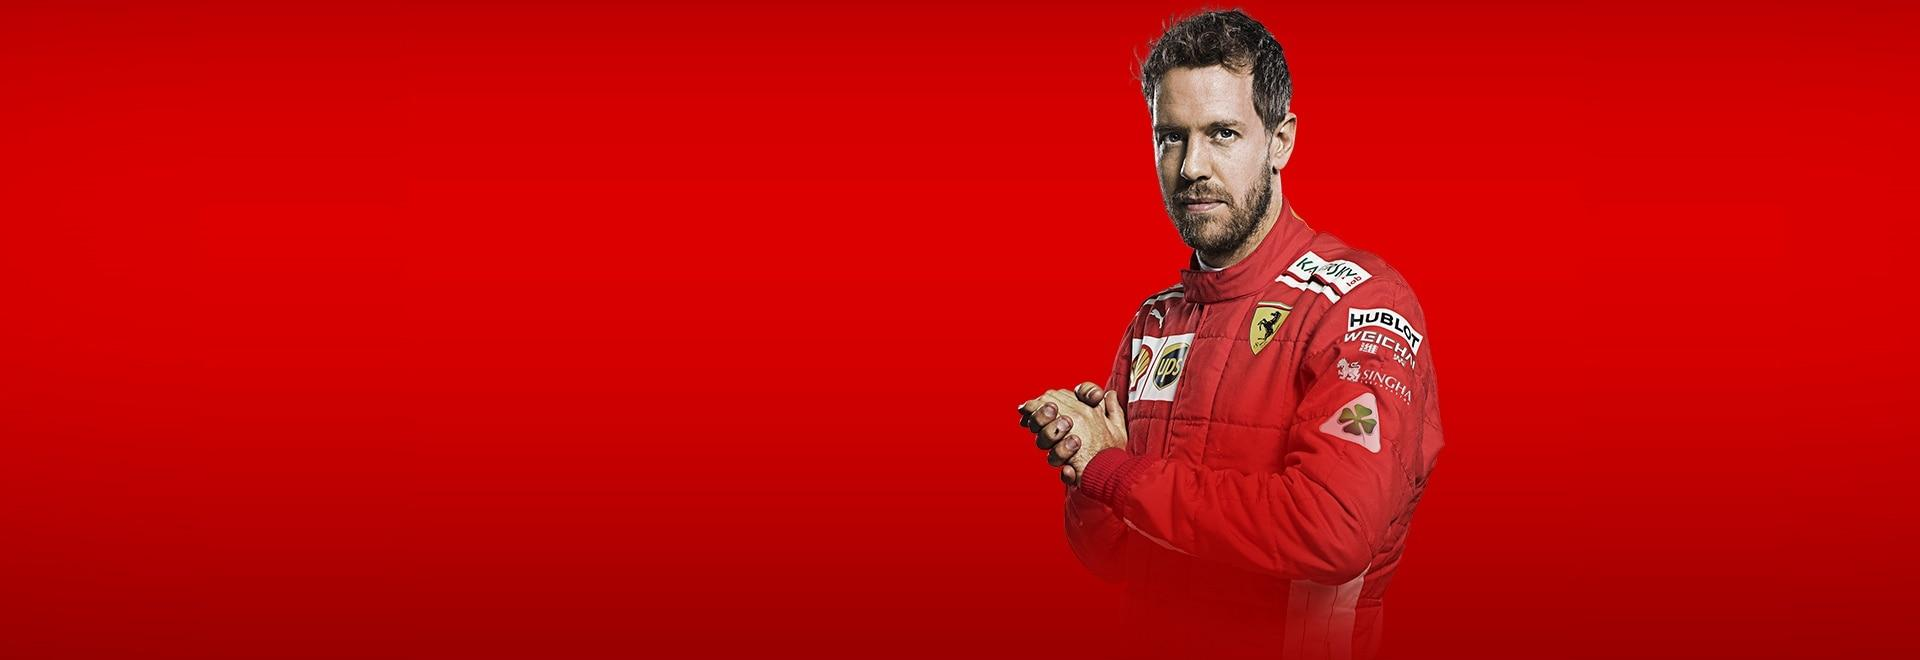 Vettel - L'italiano